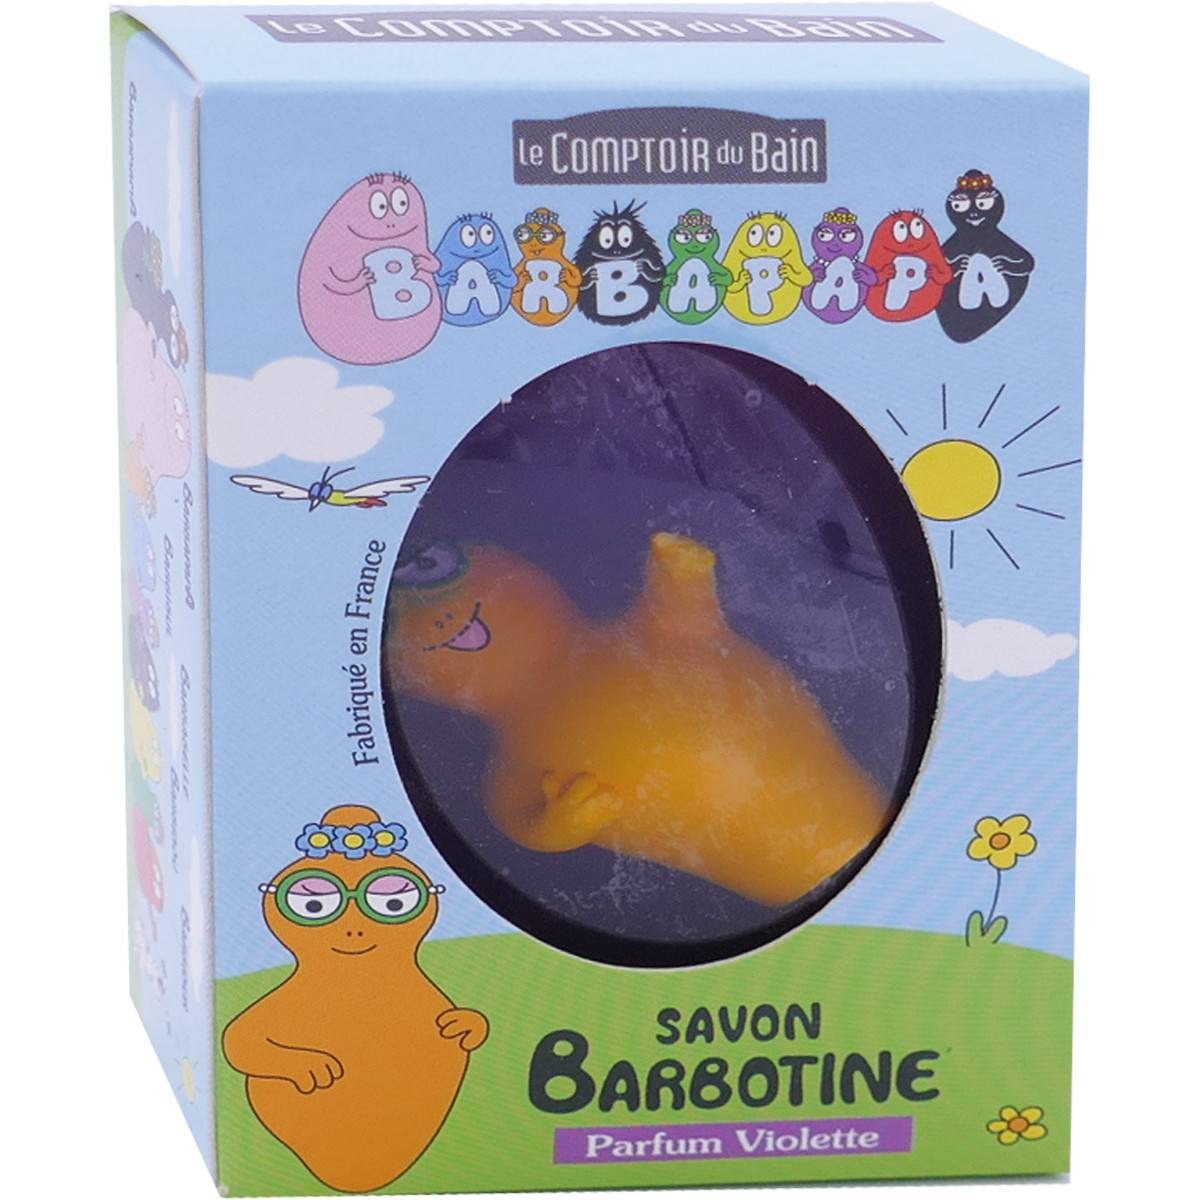 LE COMPTOIR DU BAIN Barbapapa savon barbotine parfum violette 84g + figurine